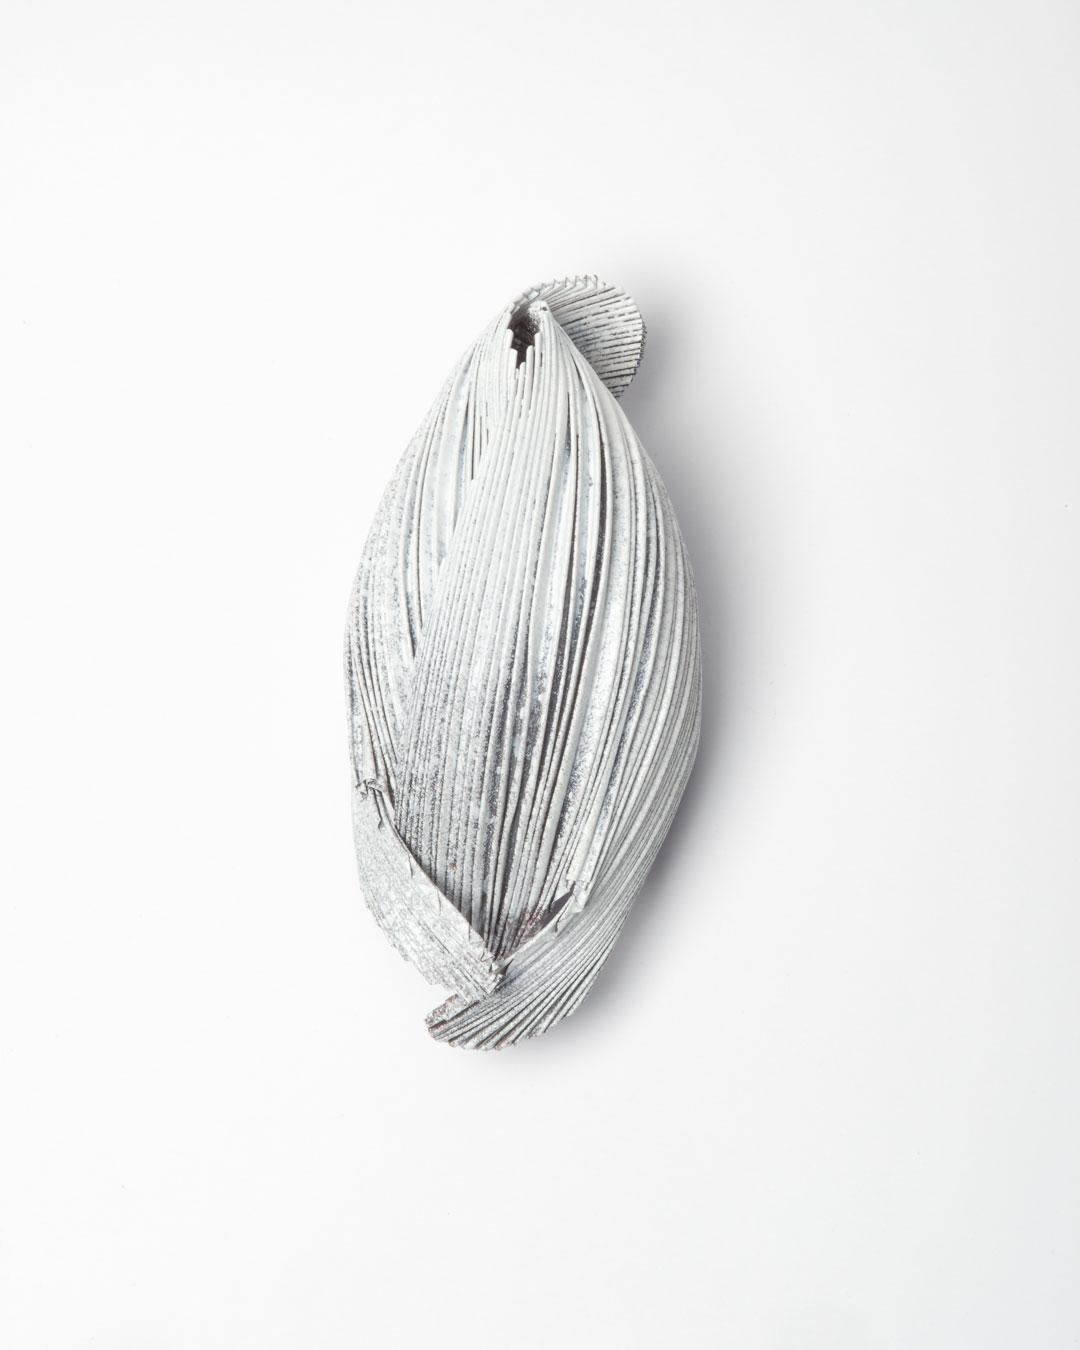 Li Liang. Nr. 4: Line, 2018, brooch; copper, 100 x 50 x 40 mm, €1650